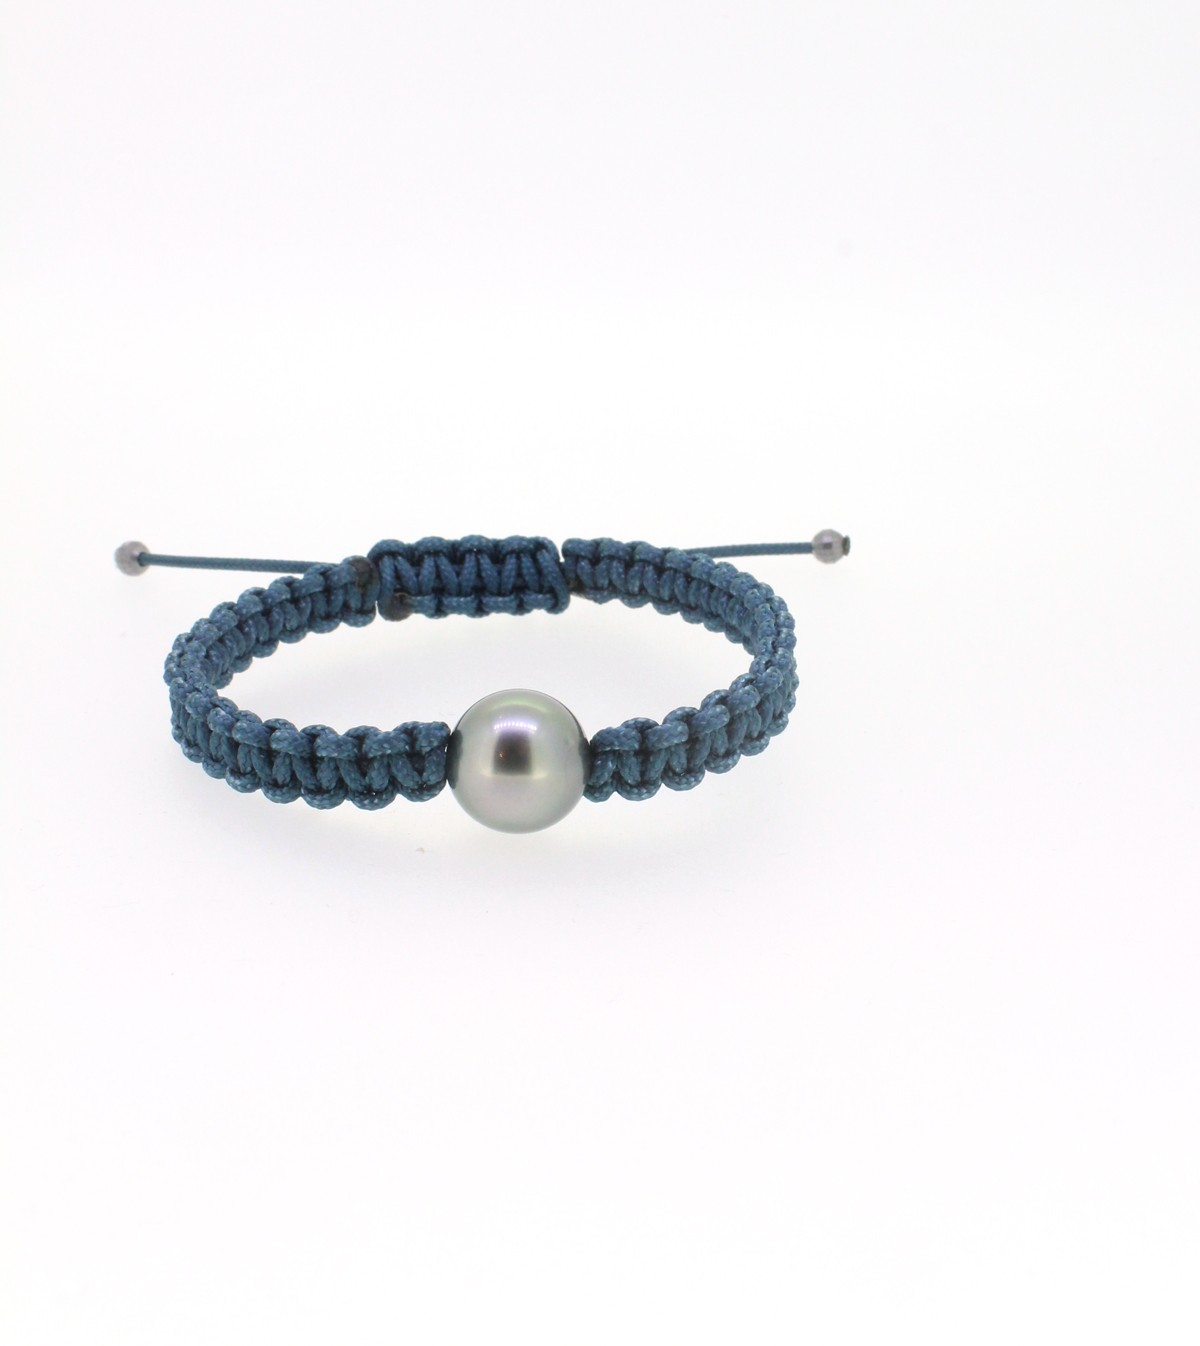 Armband Pearlmates Tahiti petr - Gellner - 2-81556-01